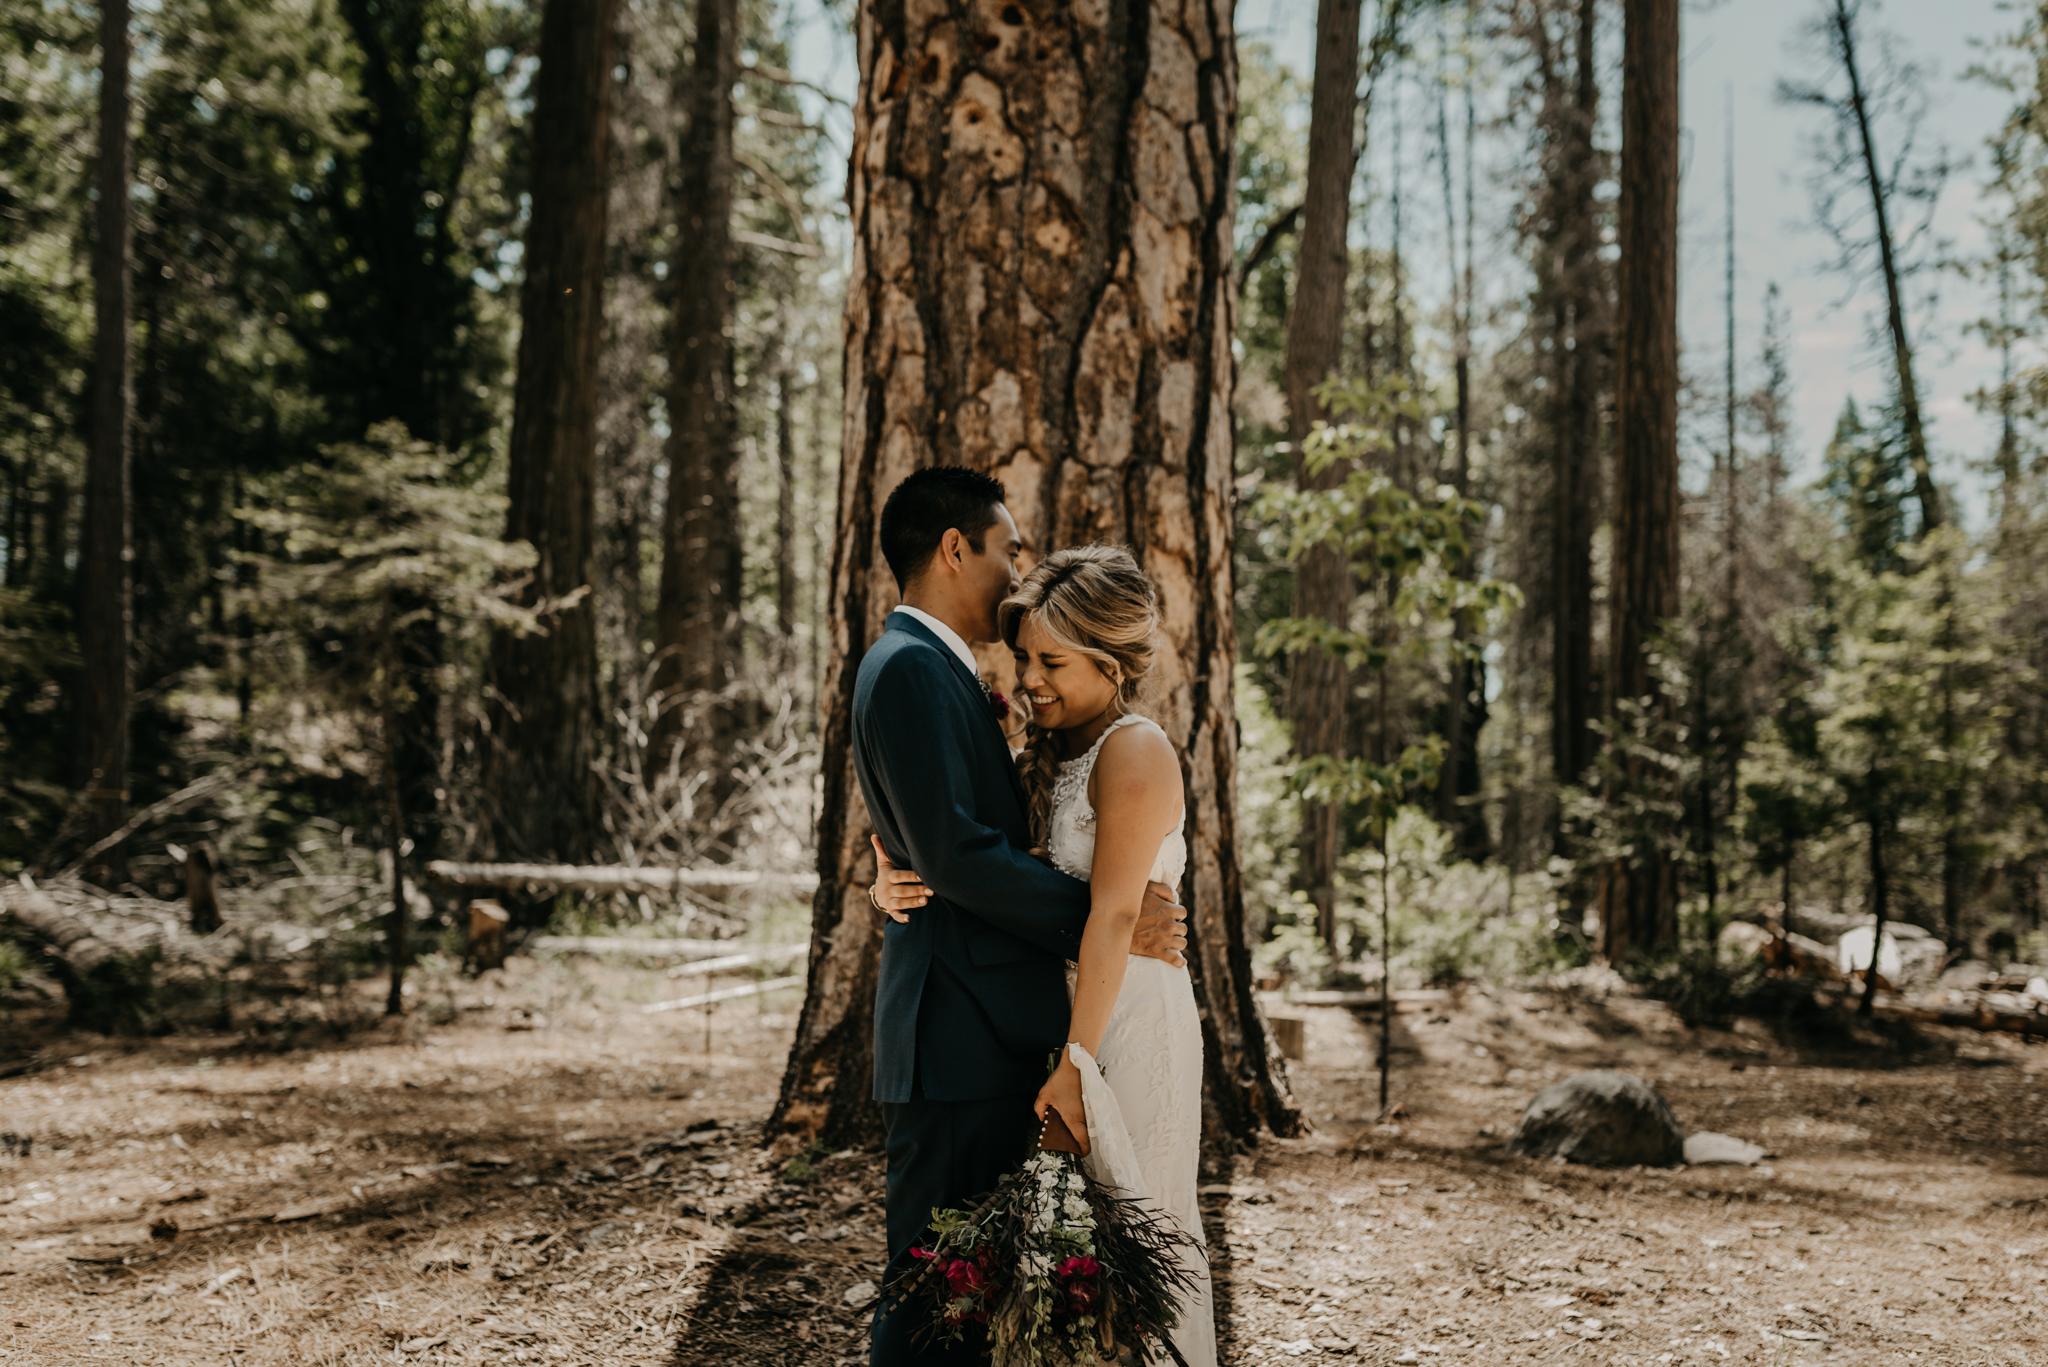 © Isaiah + Taylor Photography - Evergreen Lodge Destination Yoesmite Wedding - Los Angeles Wedding Photographer-088.jpg